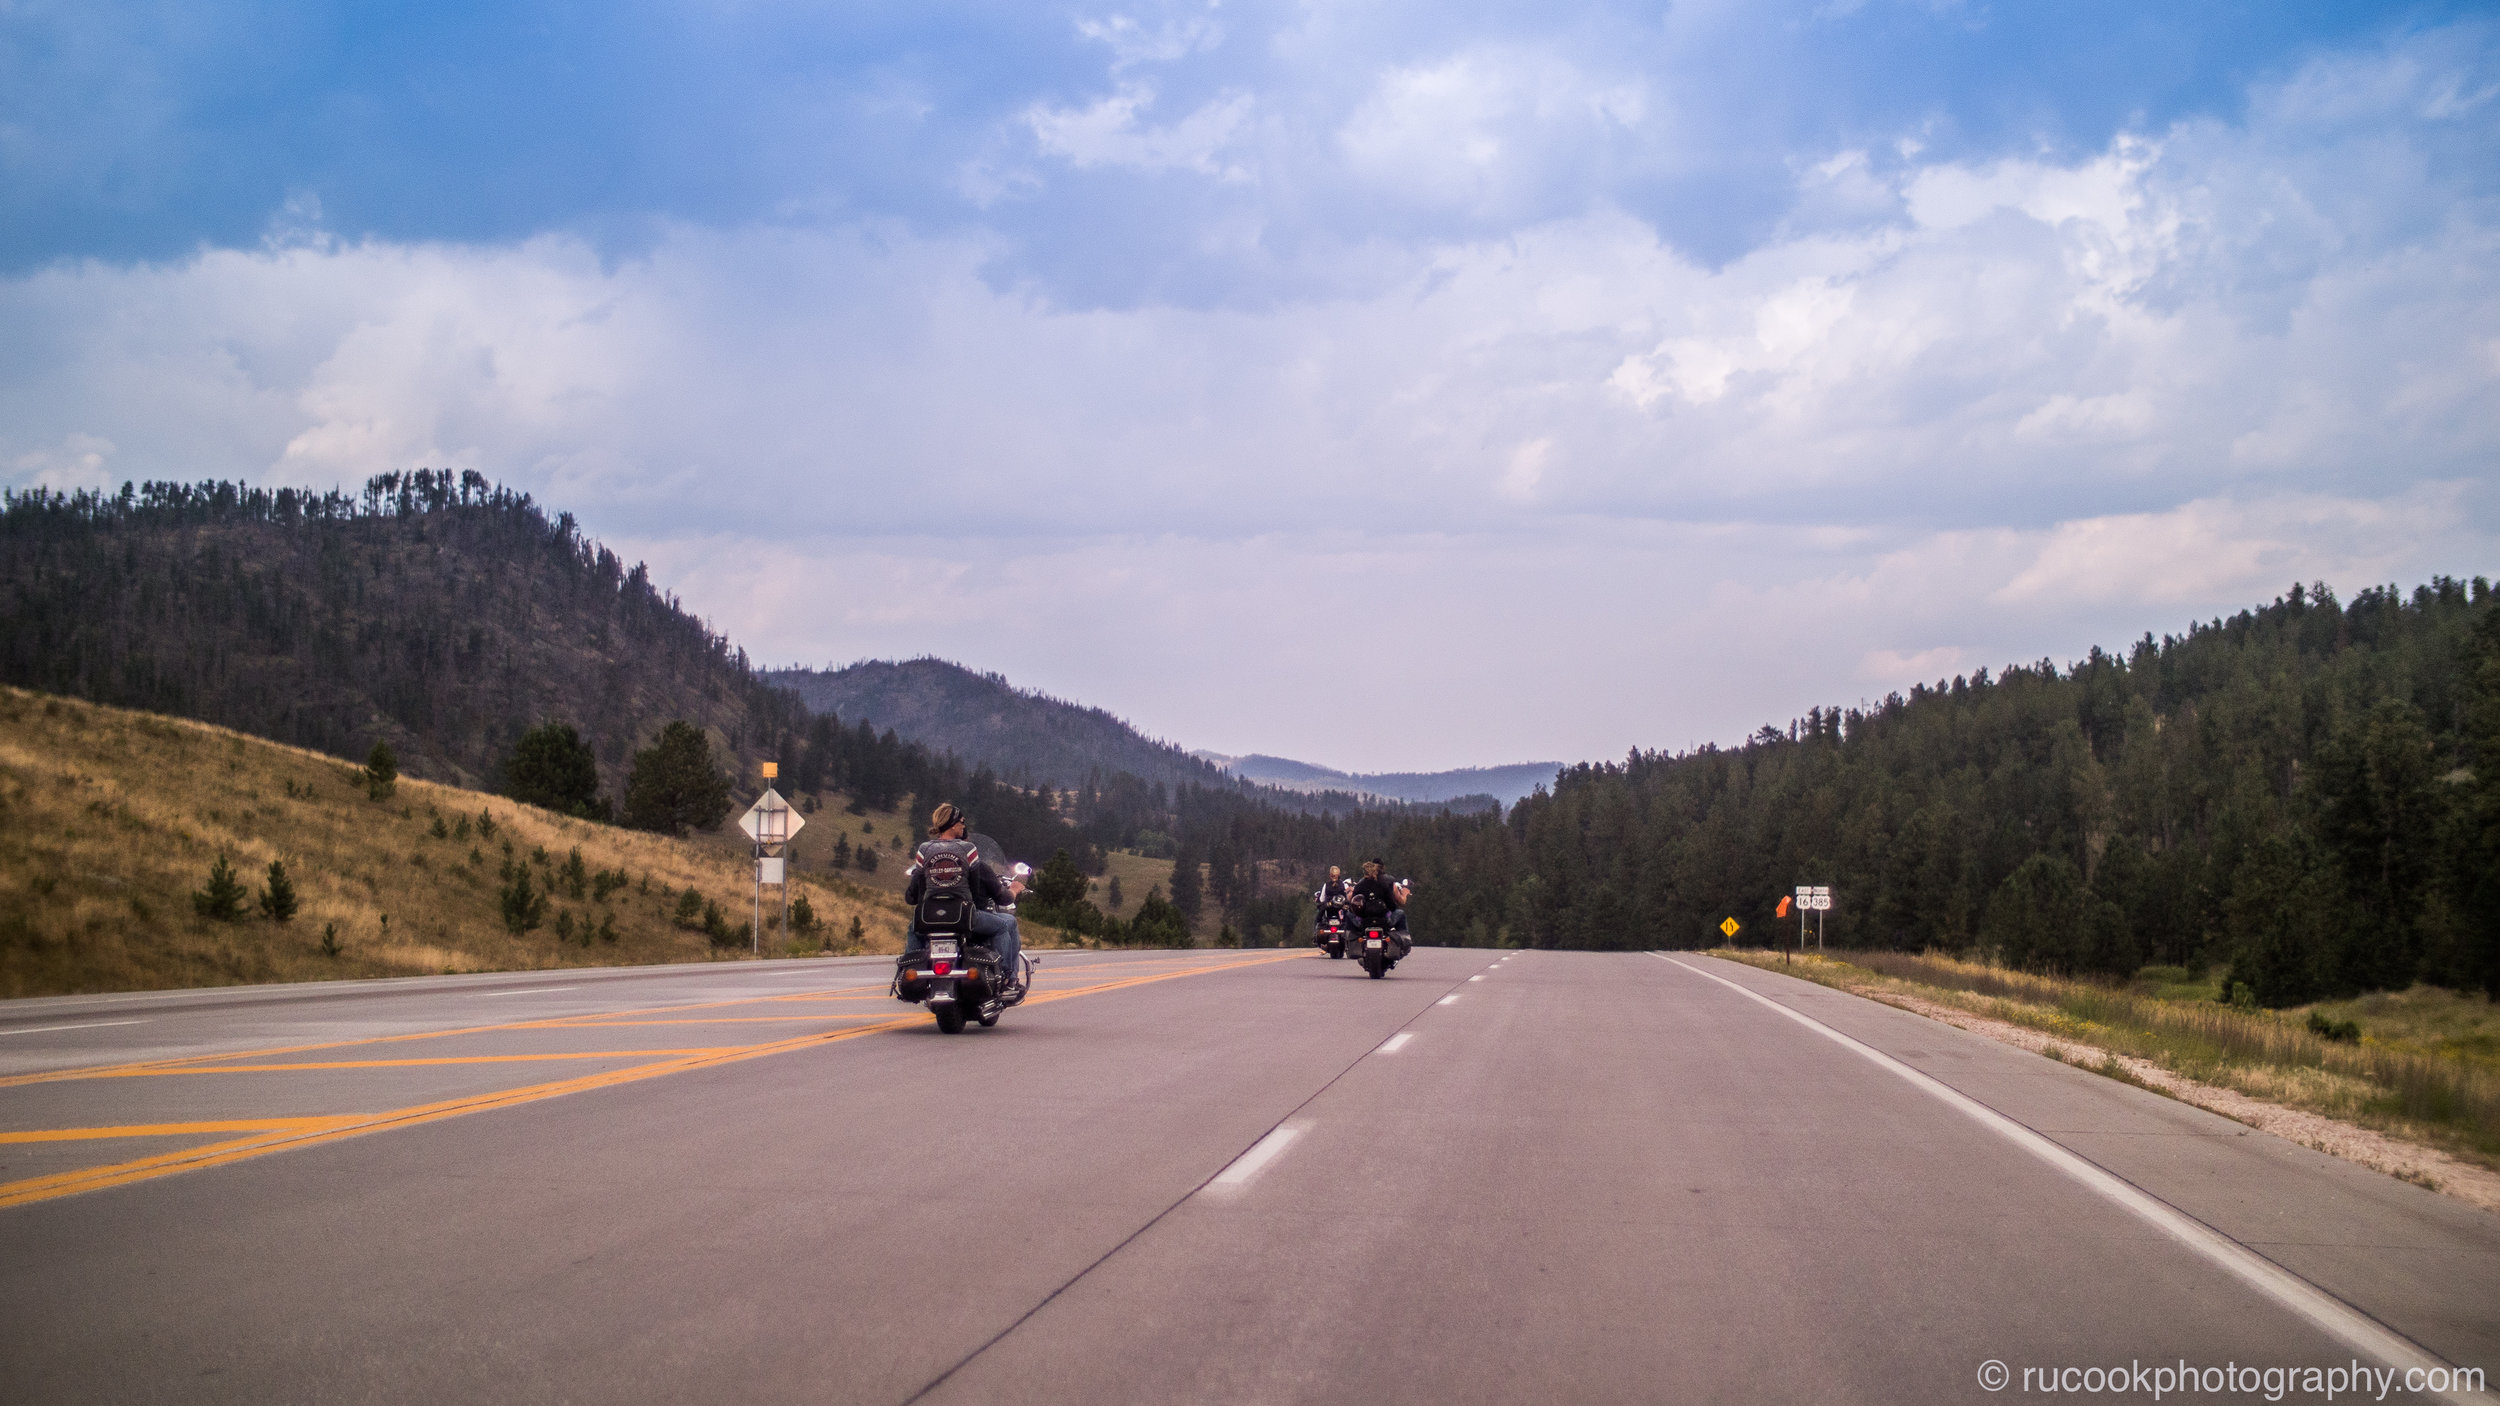 Bikers heading for Mount Rushmore